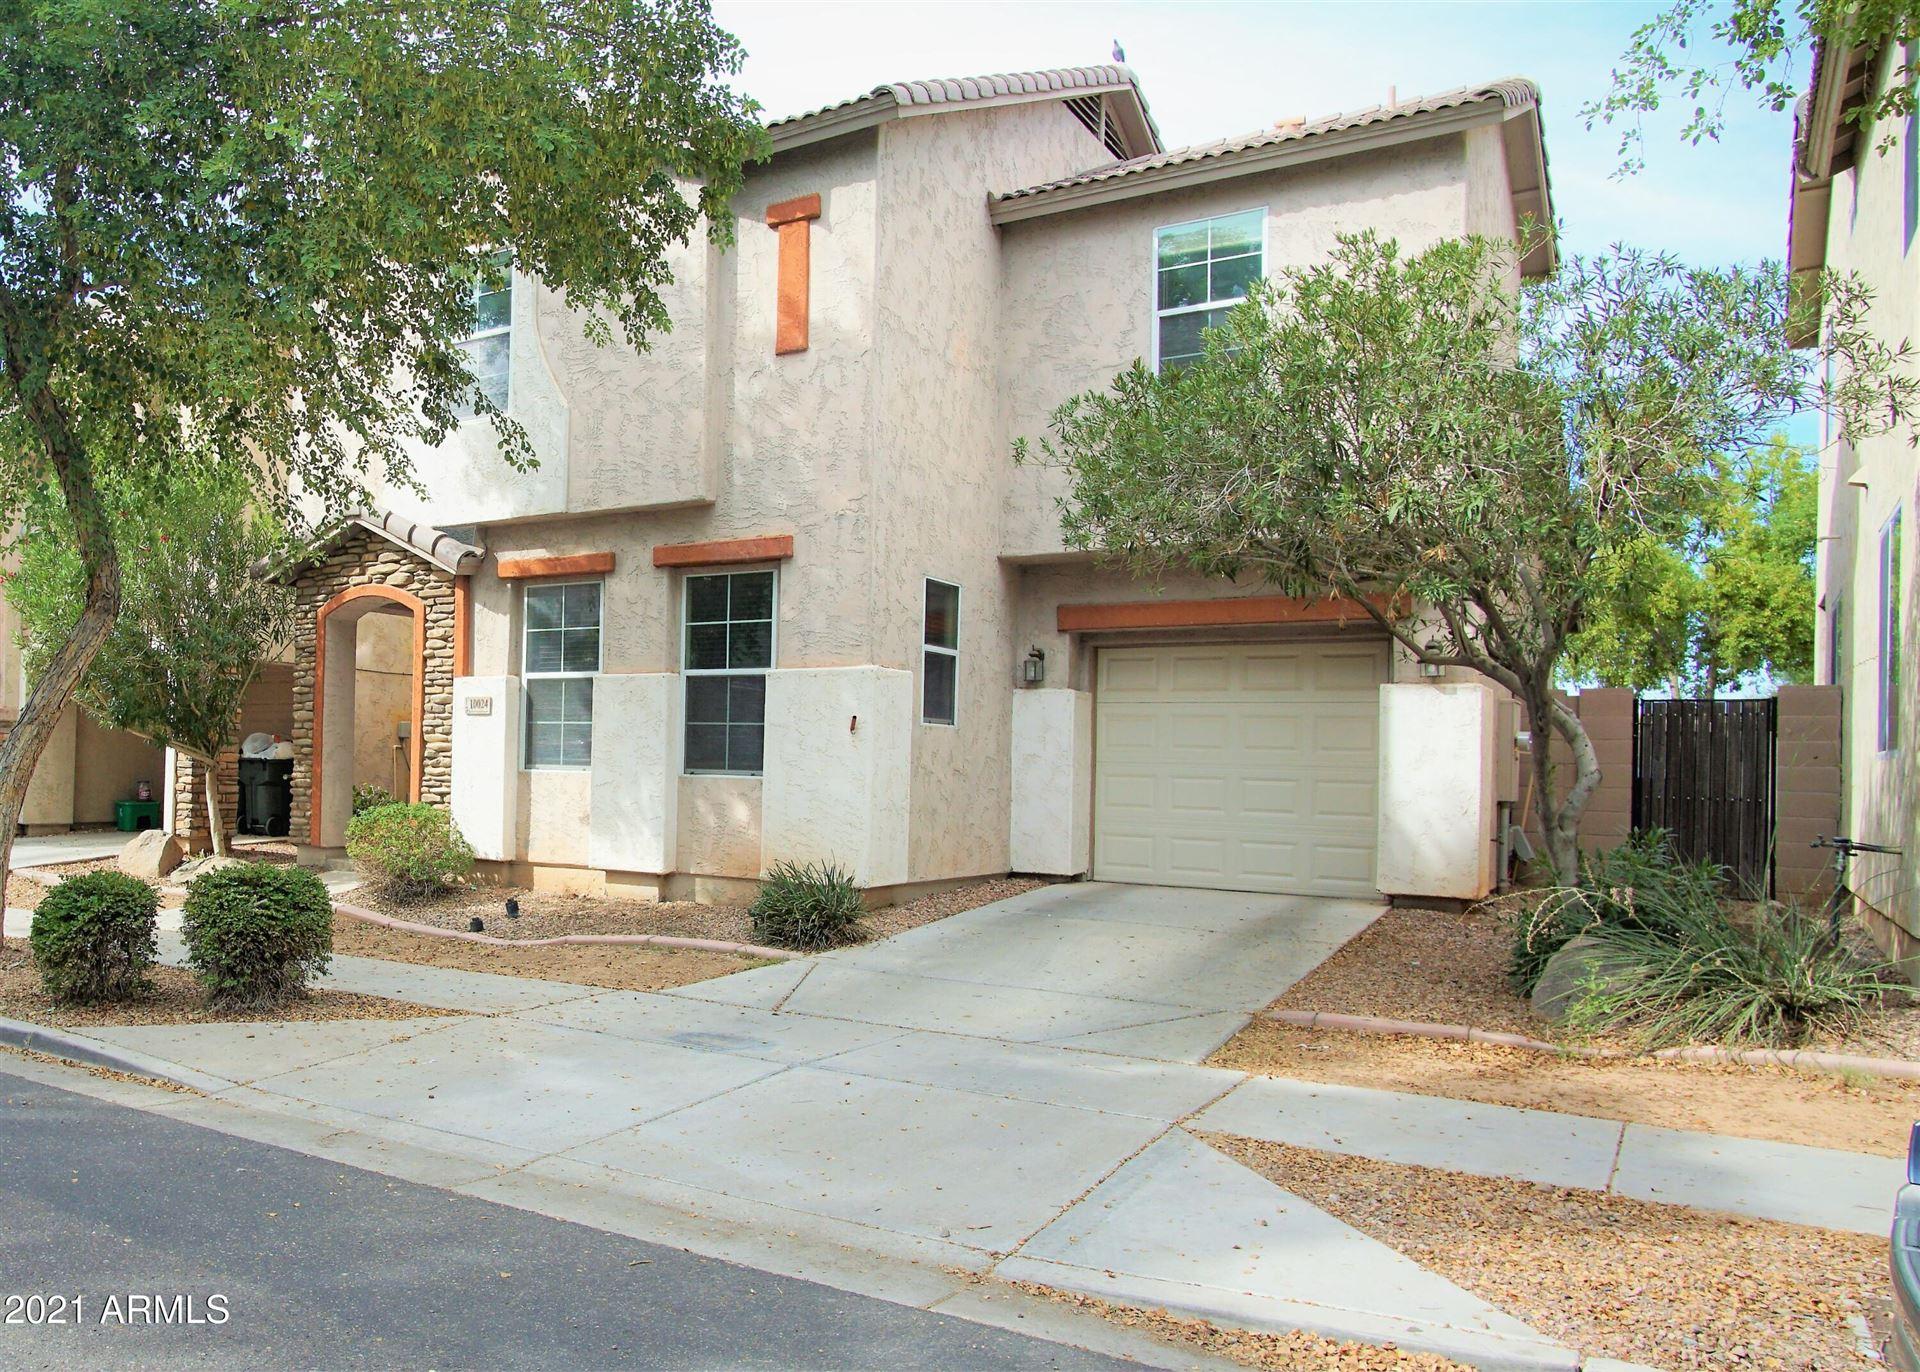 Photo of 10024 W PAYSON Road, Tolleson, AZ 85353 (MLS # 6302885)